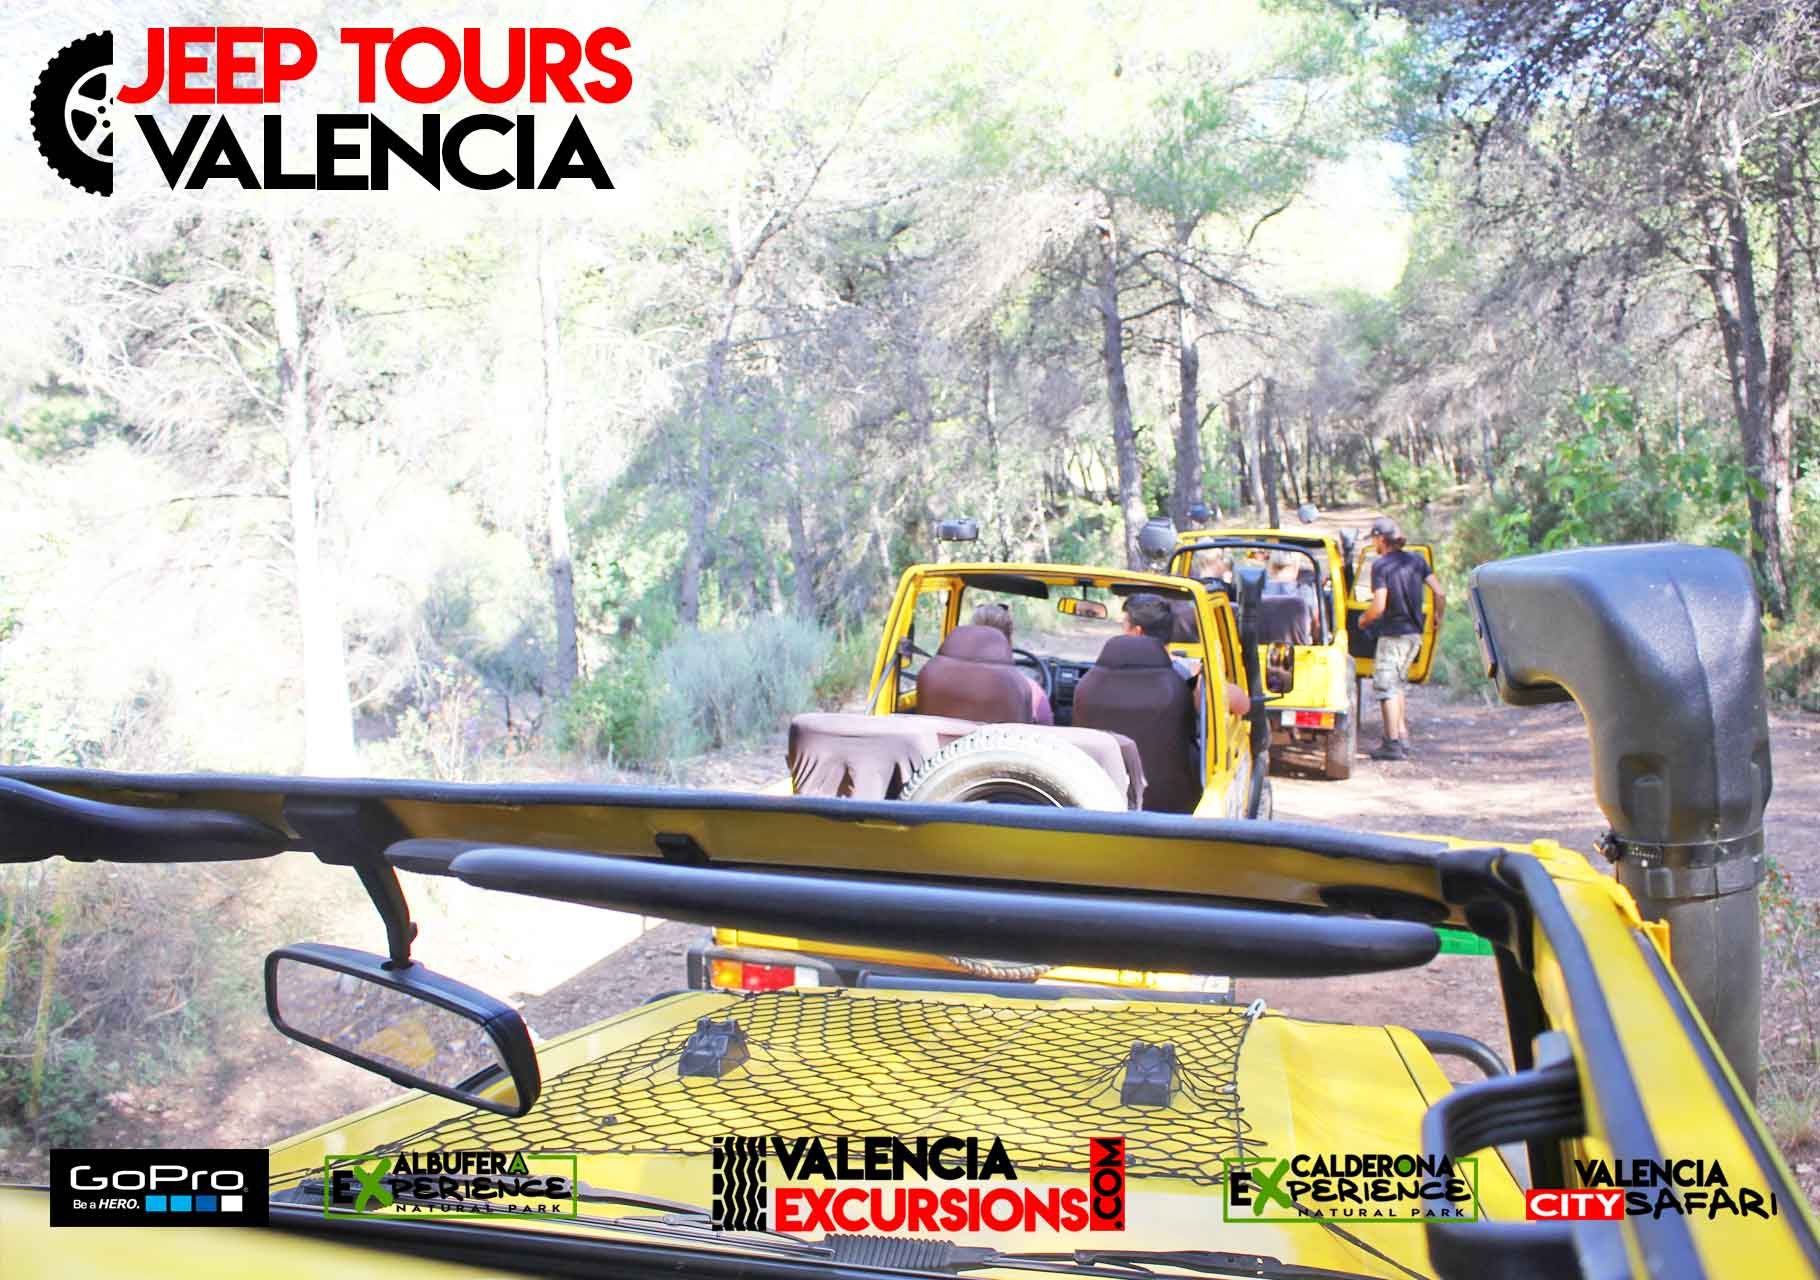 Geführte Off Road 4x4 Tour Valencia mit Jeeps. Was zu tun in Valencia- Valencia Excursions